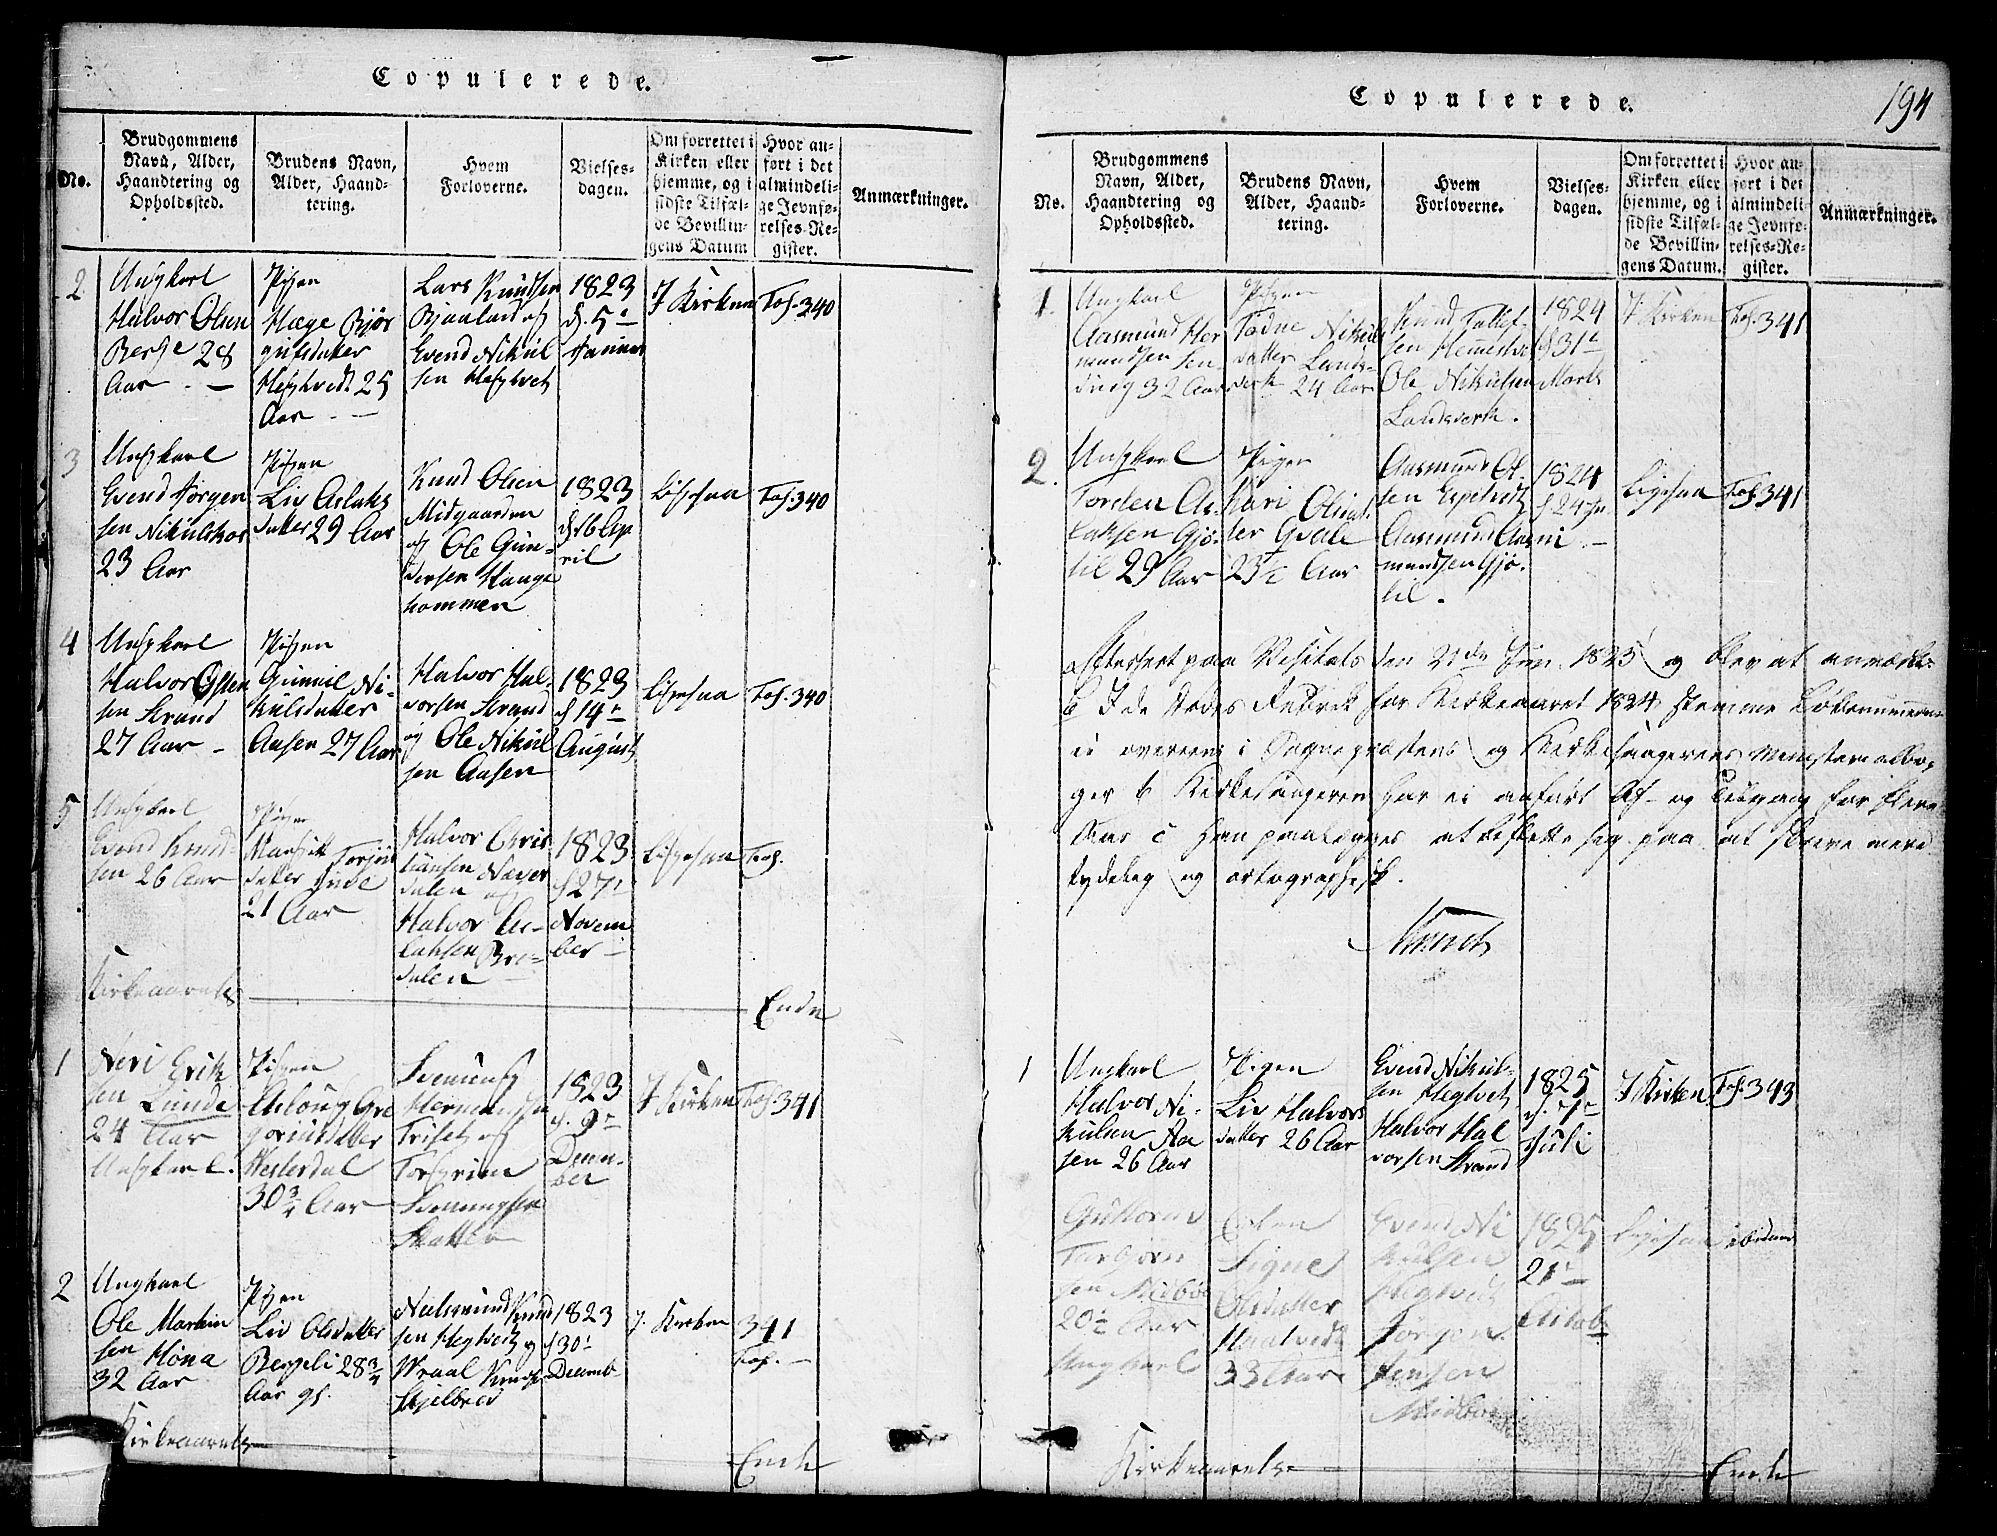 SAKO, Lårdal kirkebøker, G/Ga/L0001: Klokkerbok nr. I 1, 1815-1861, s. 194